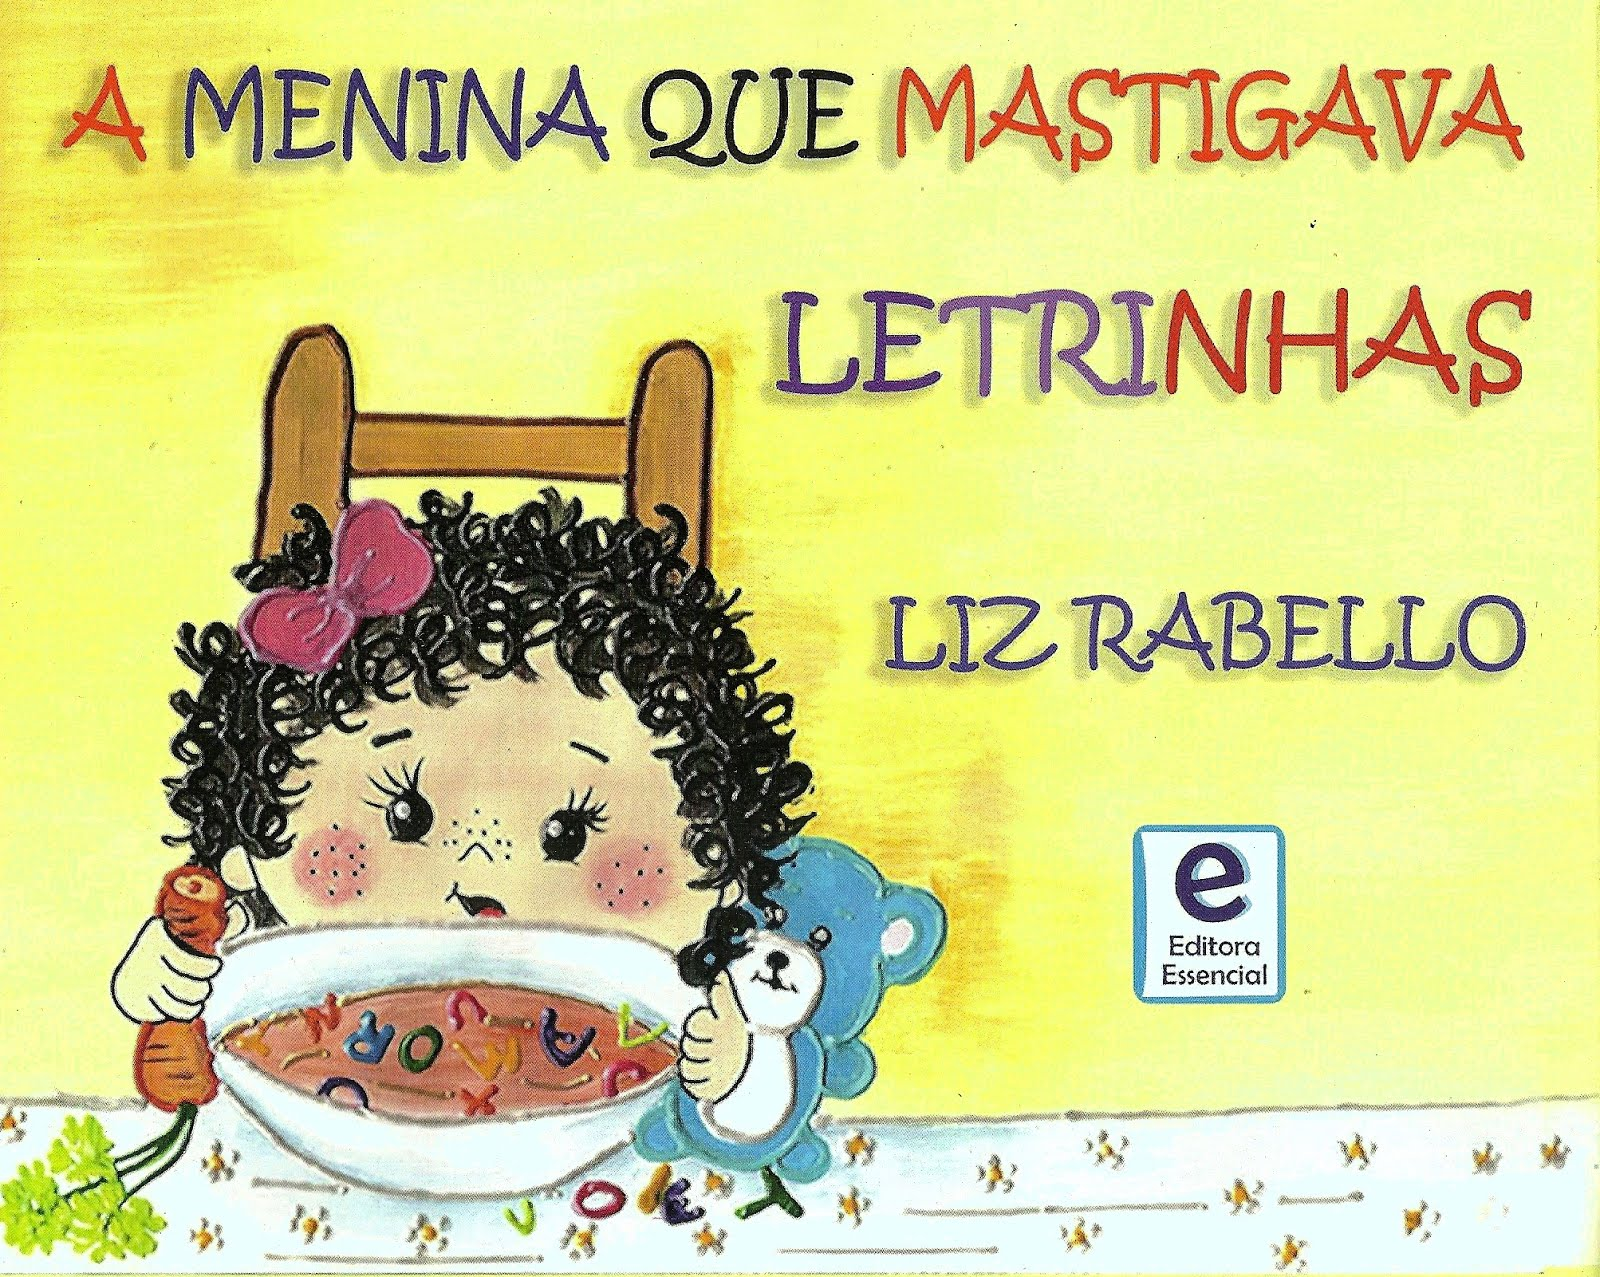 A MENINA QUE MASTIGAVA LETRINHAS de Liz Rabello